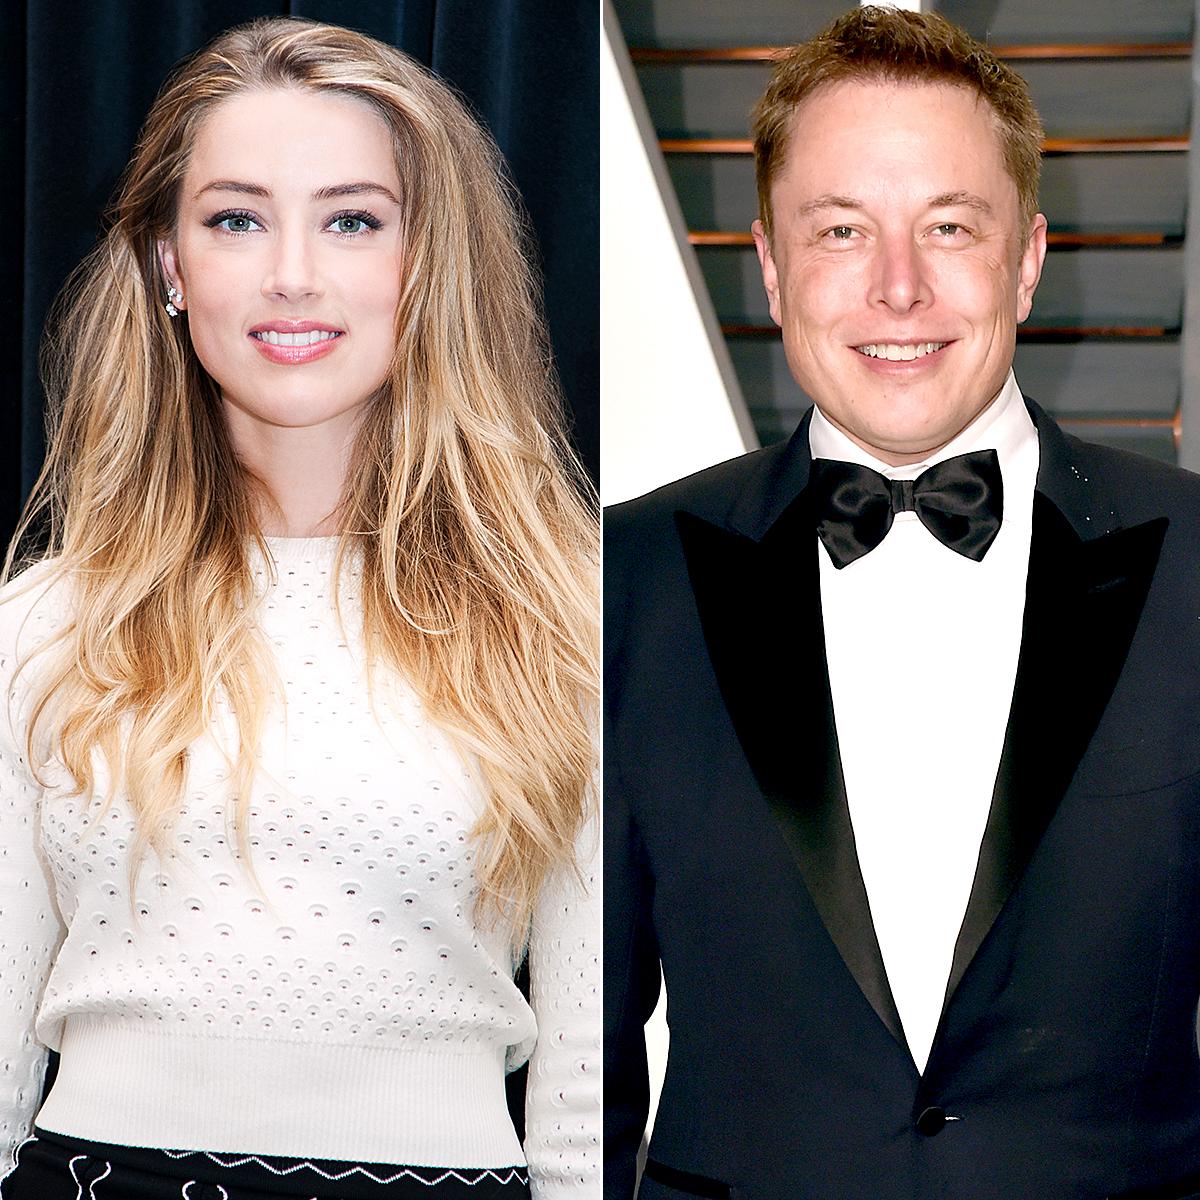 Amber Heard is going to marry billionaire Ilona Mask 04/19/2017 18